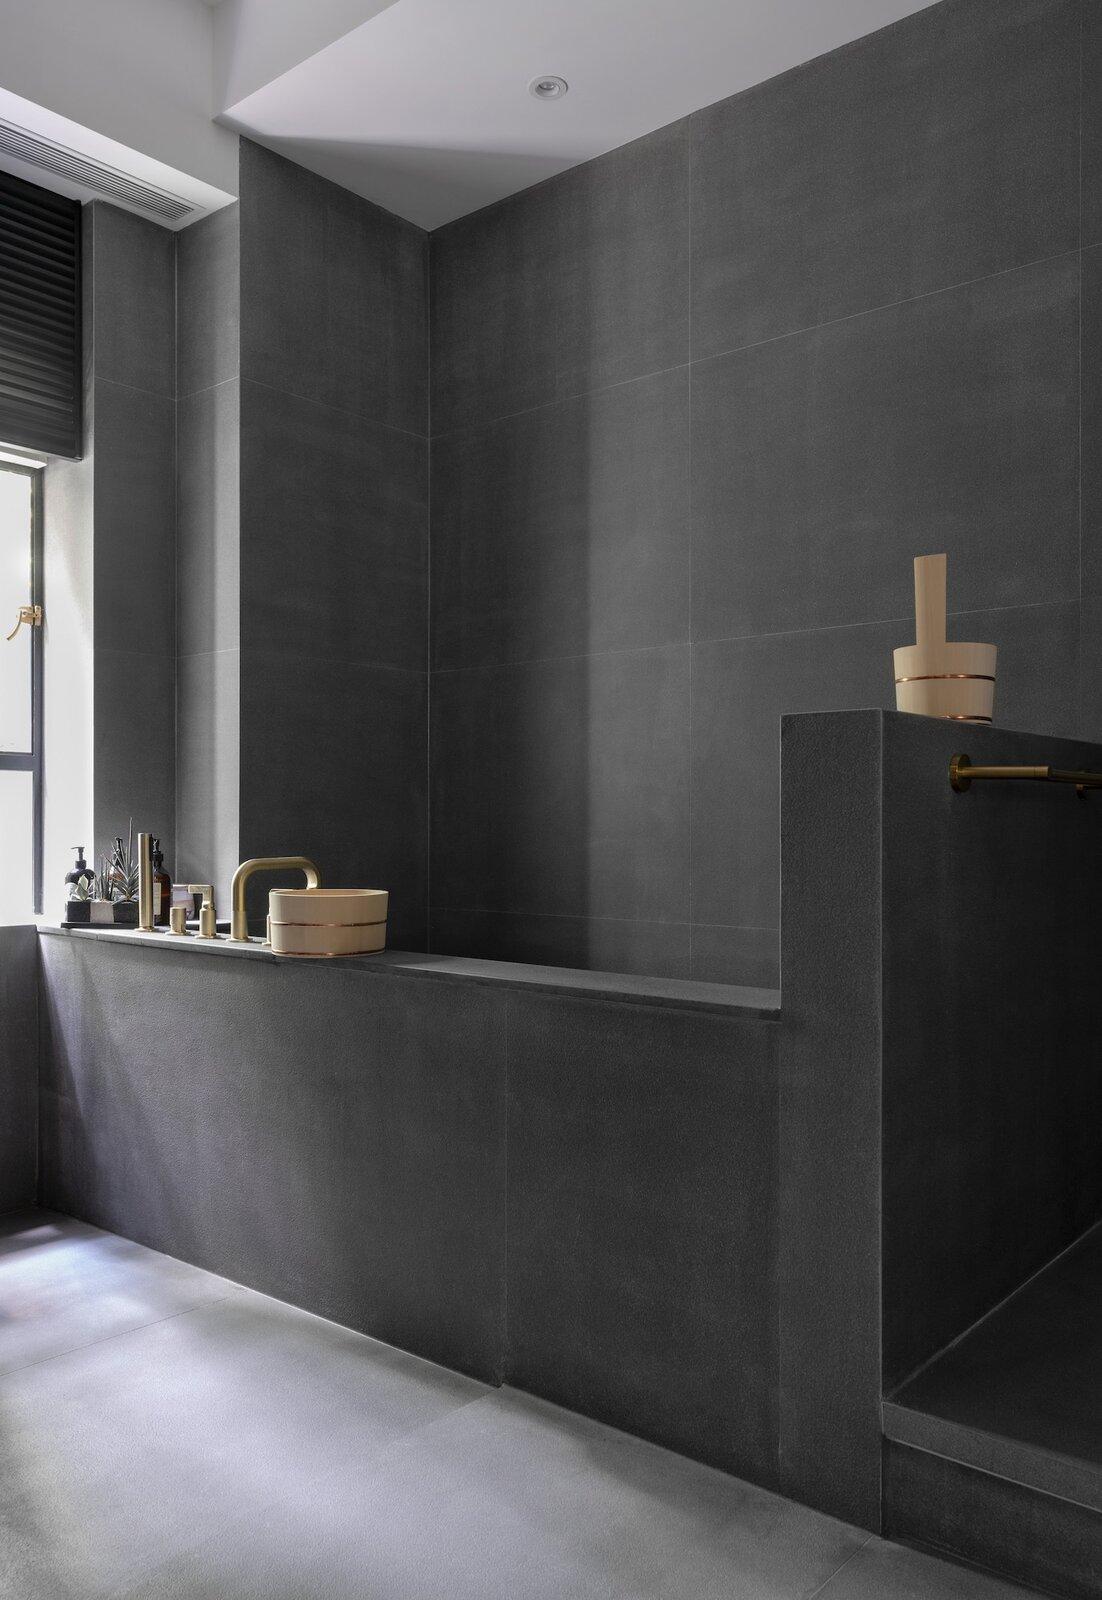 Grosvenor Residence by Lim + Lu